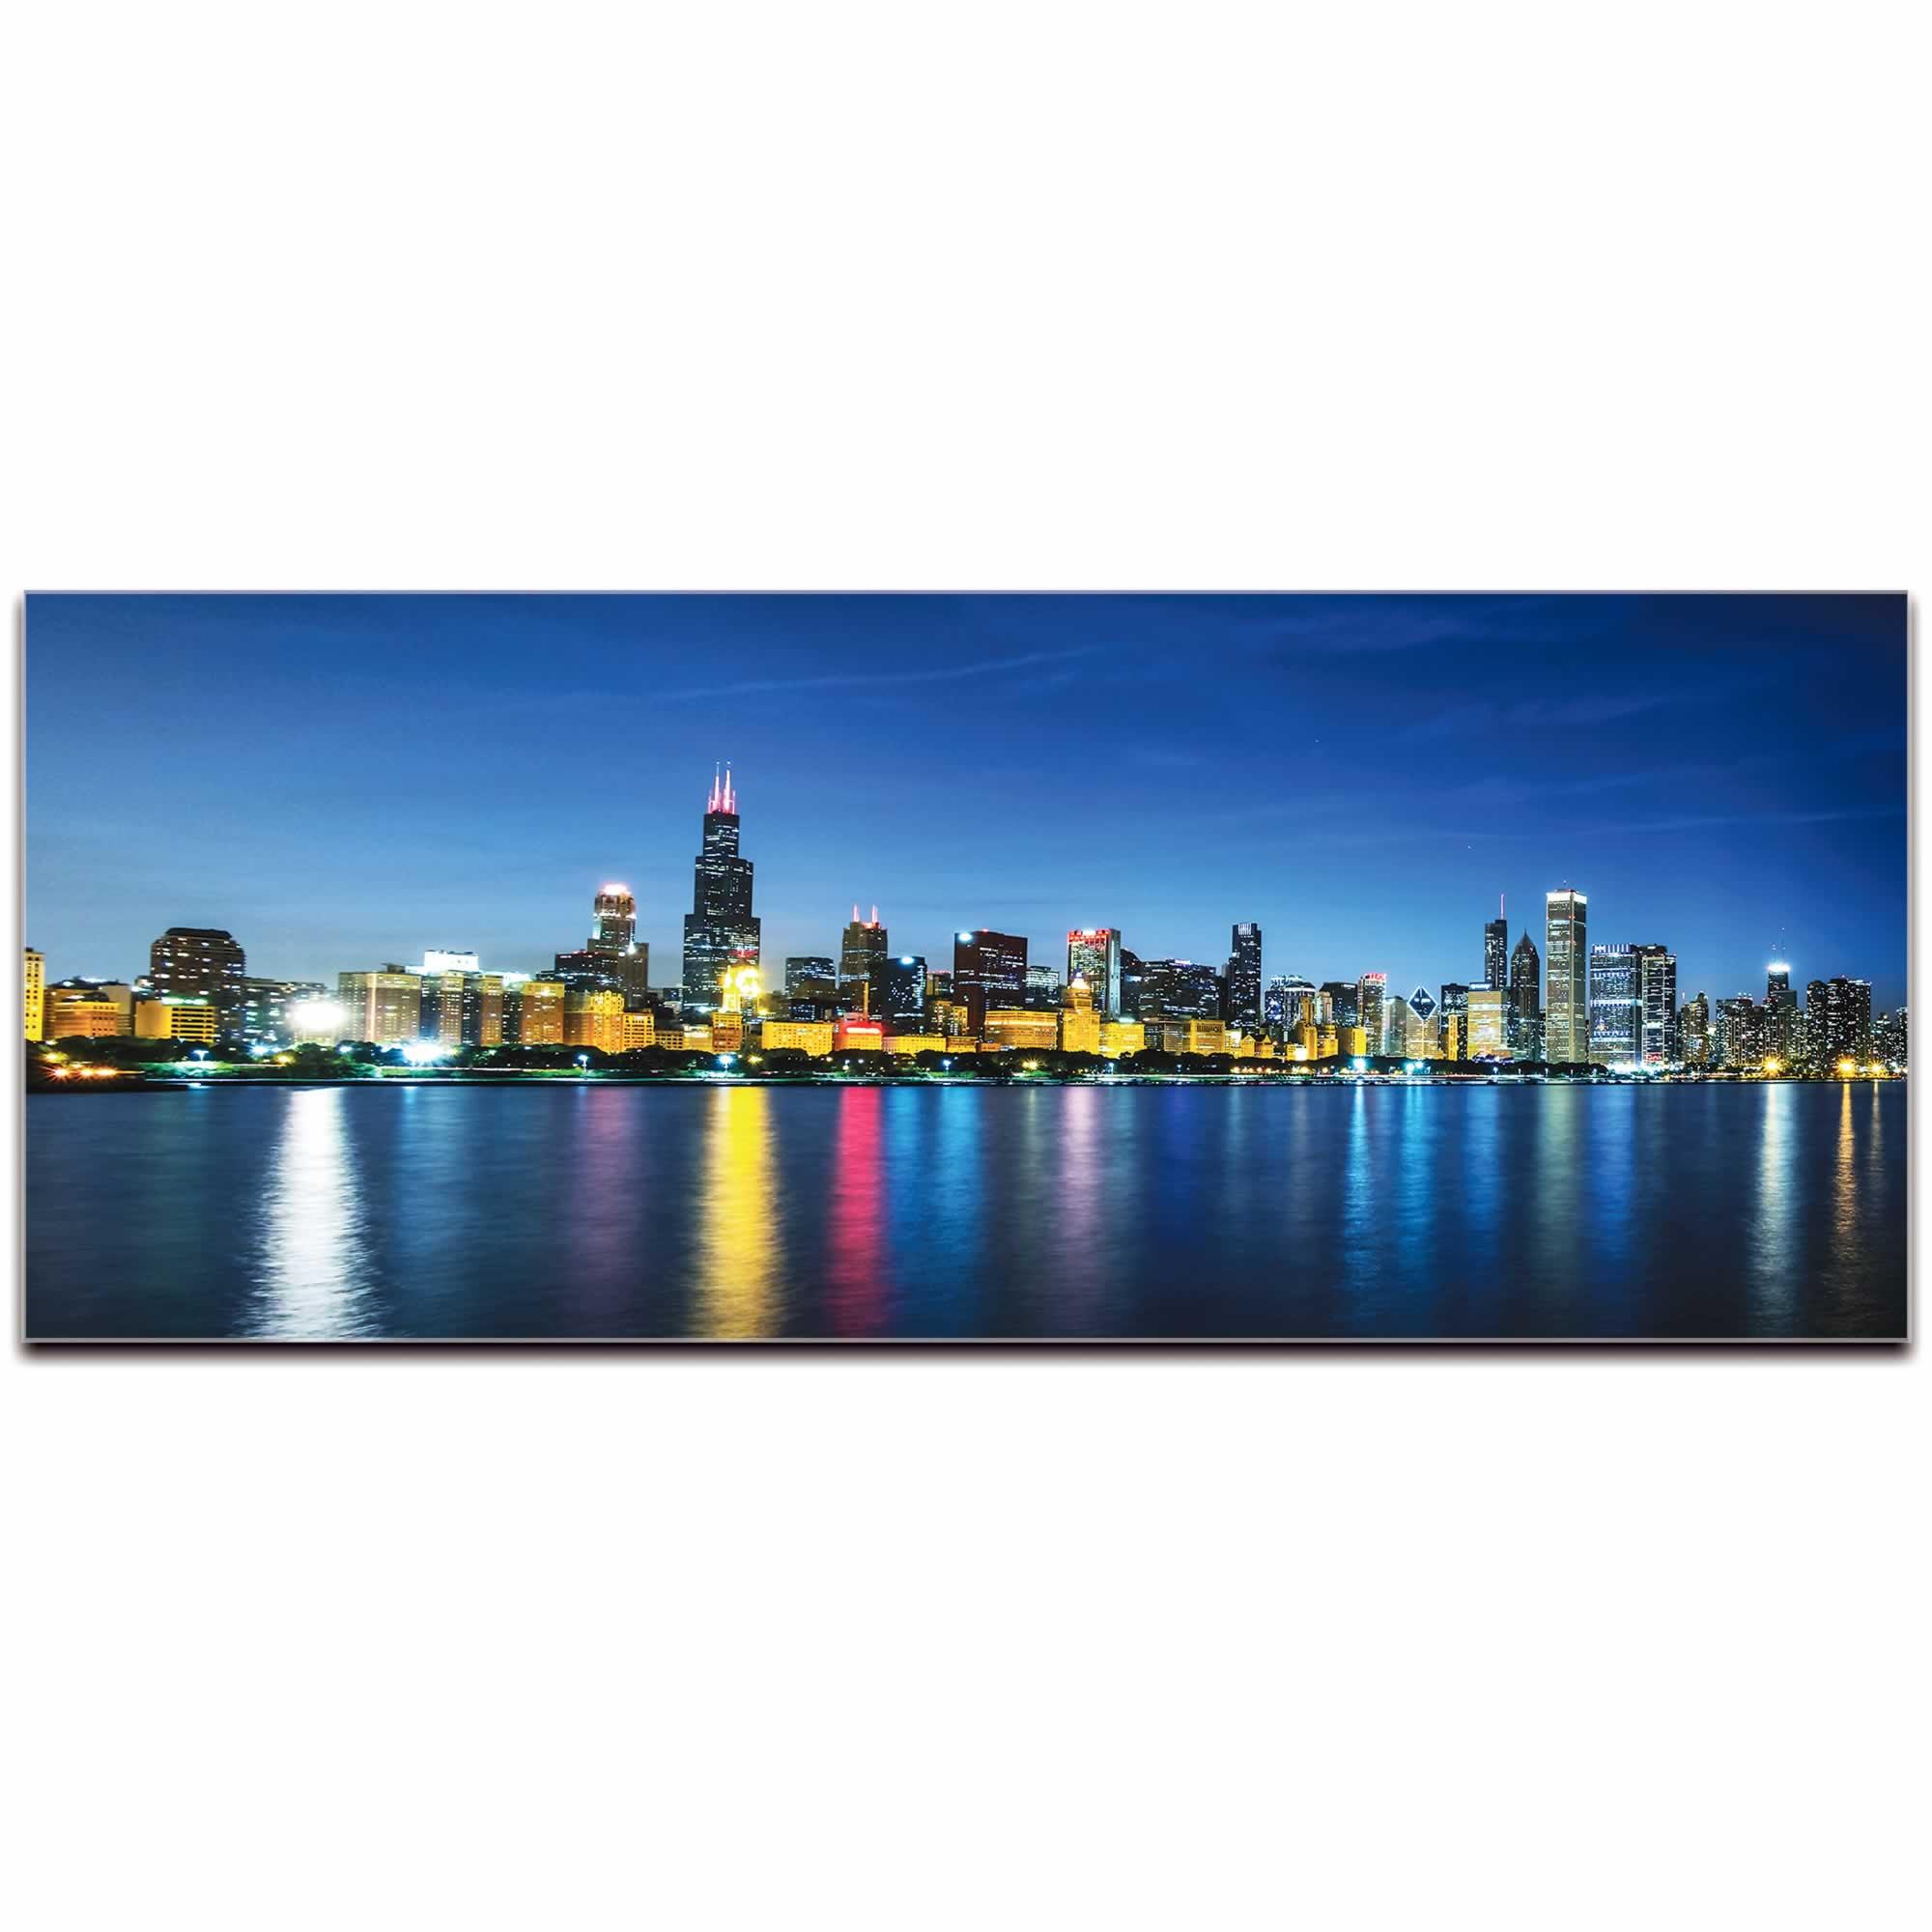 Chicago City Skyline - Urban Modern Art, Designer Home Decor, Cityscape Wall Artwork, Trendy Contemporary Art